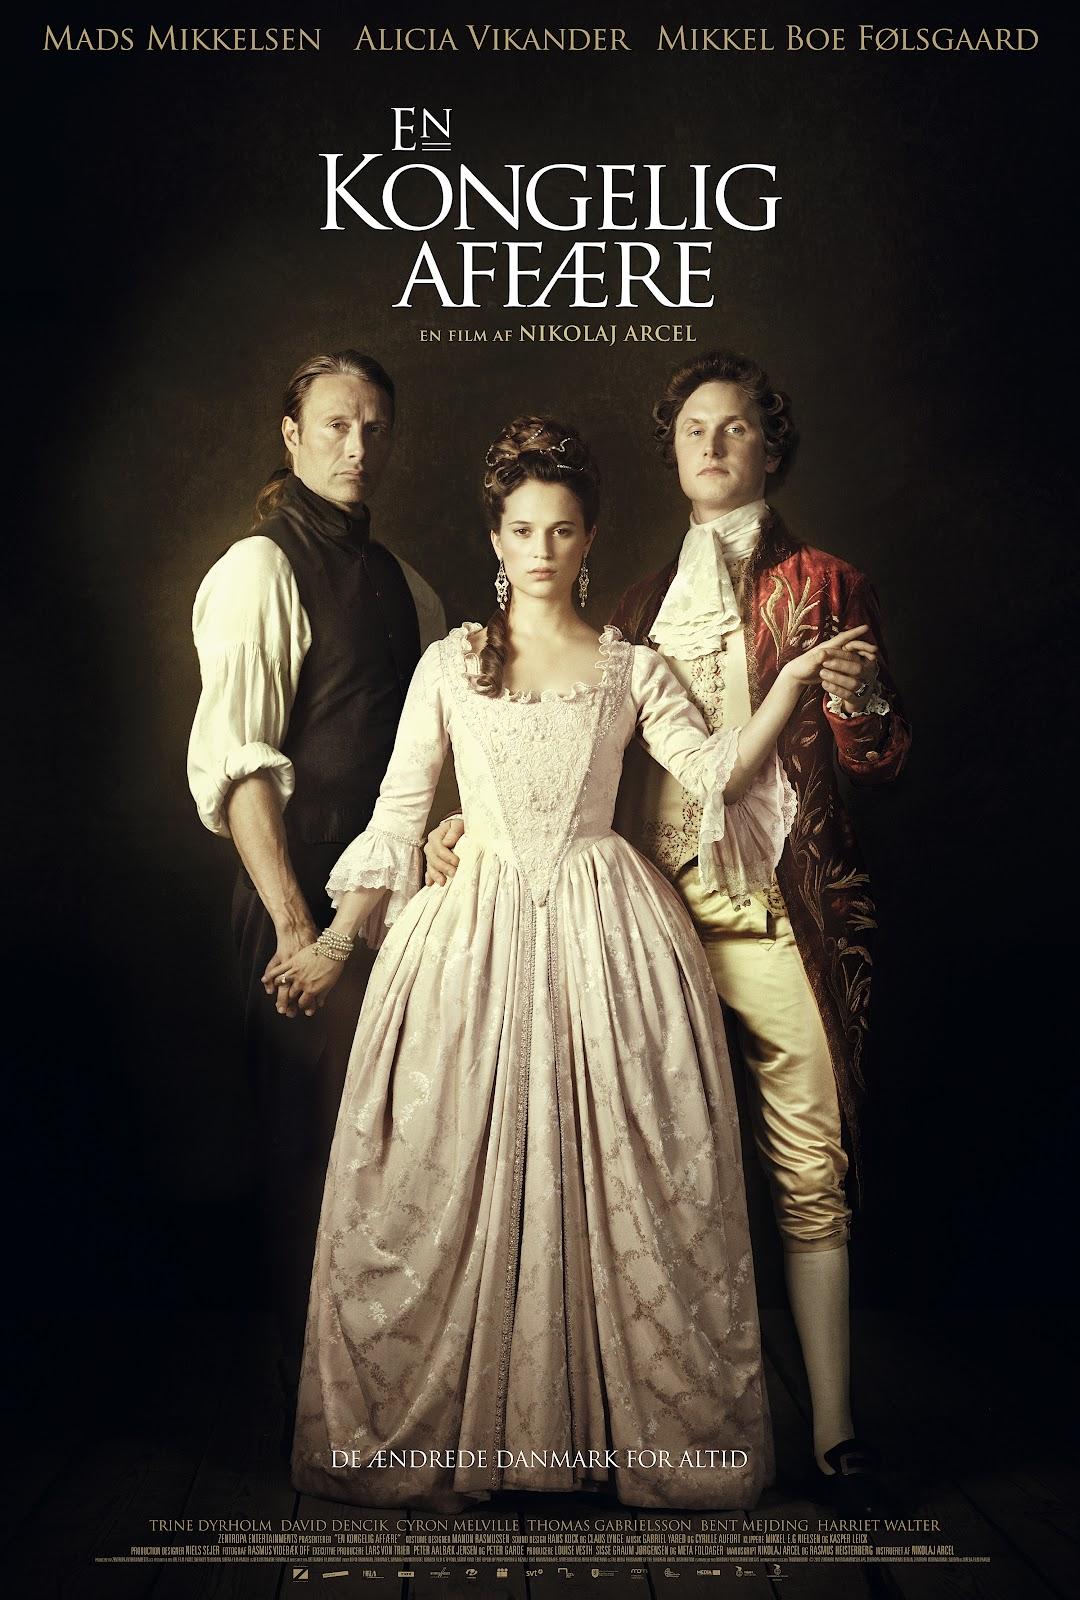 royal affair a en kongelig affaere